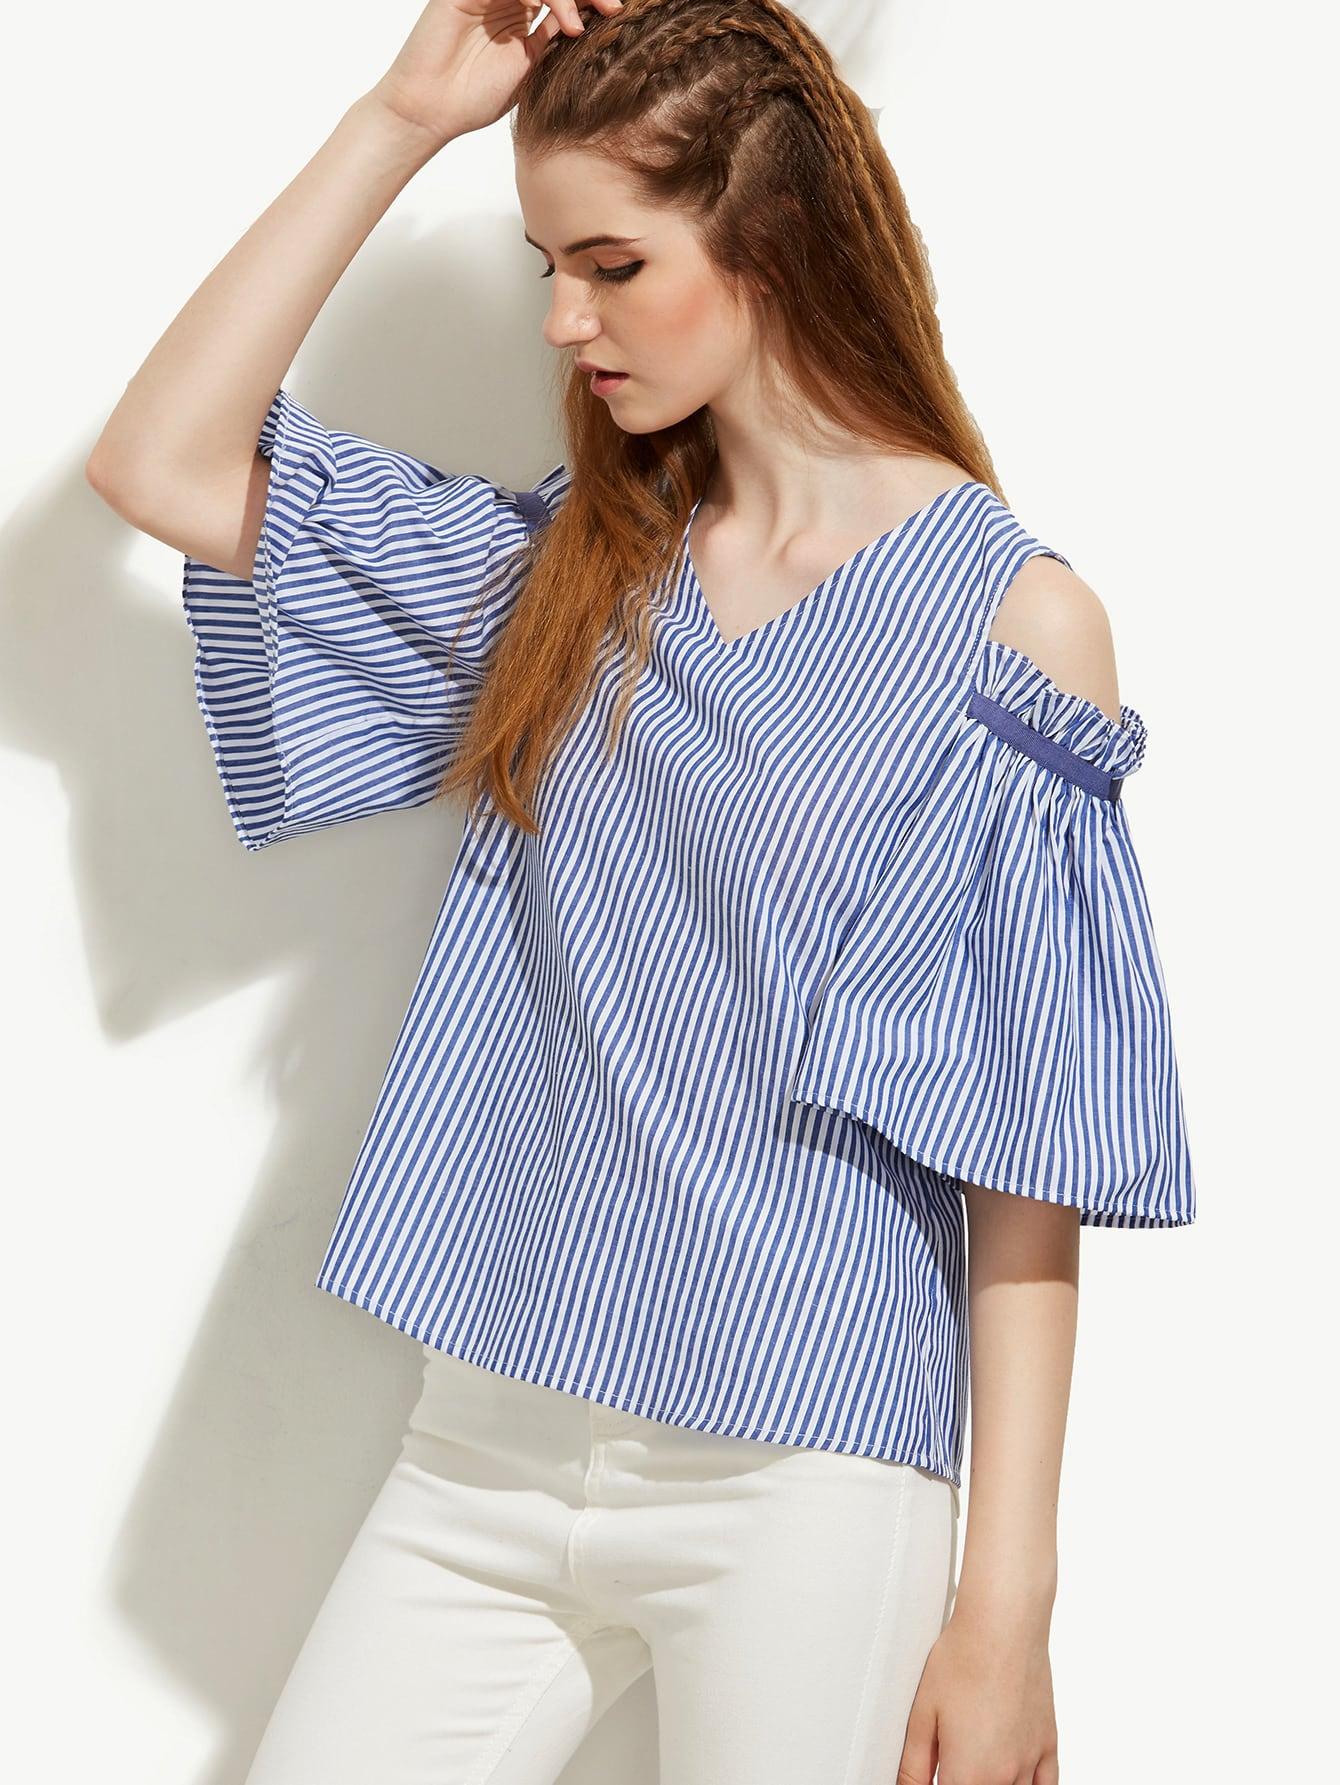 30187e66a91 Cheap Blue Striped V Neck Cold Shoulder Blouse for sale Australia   SHEIN